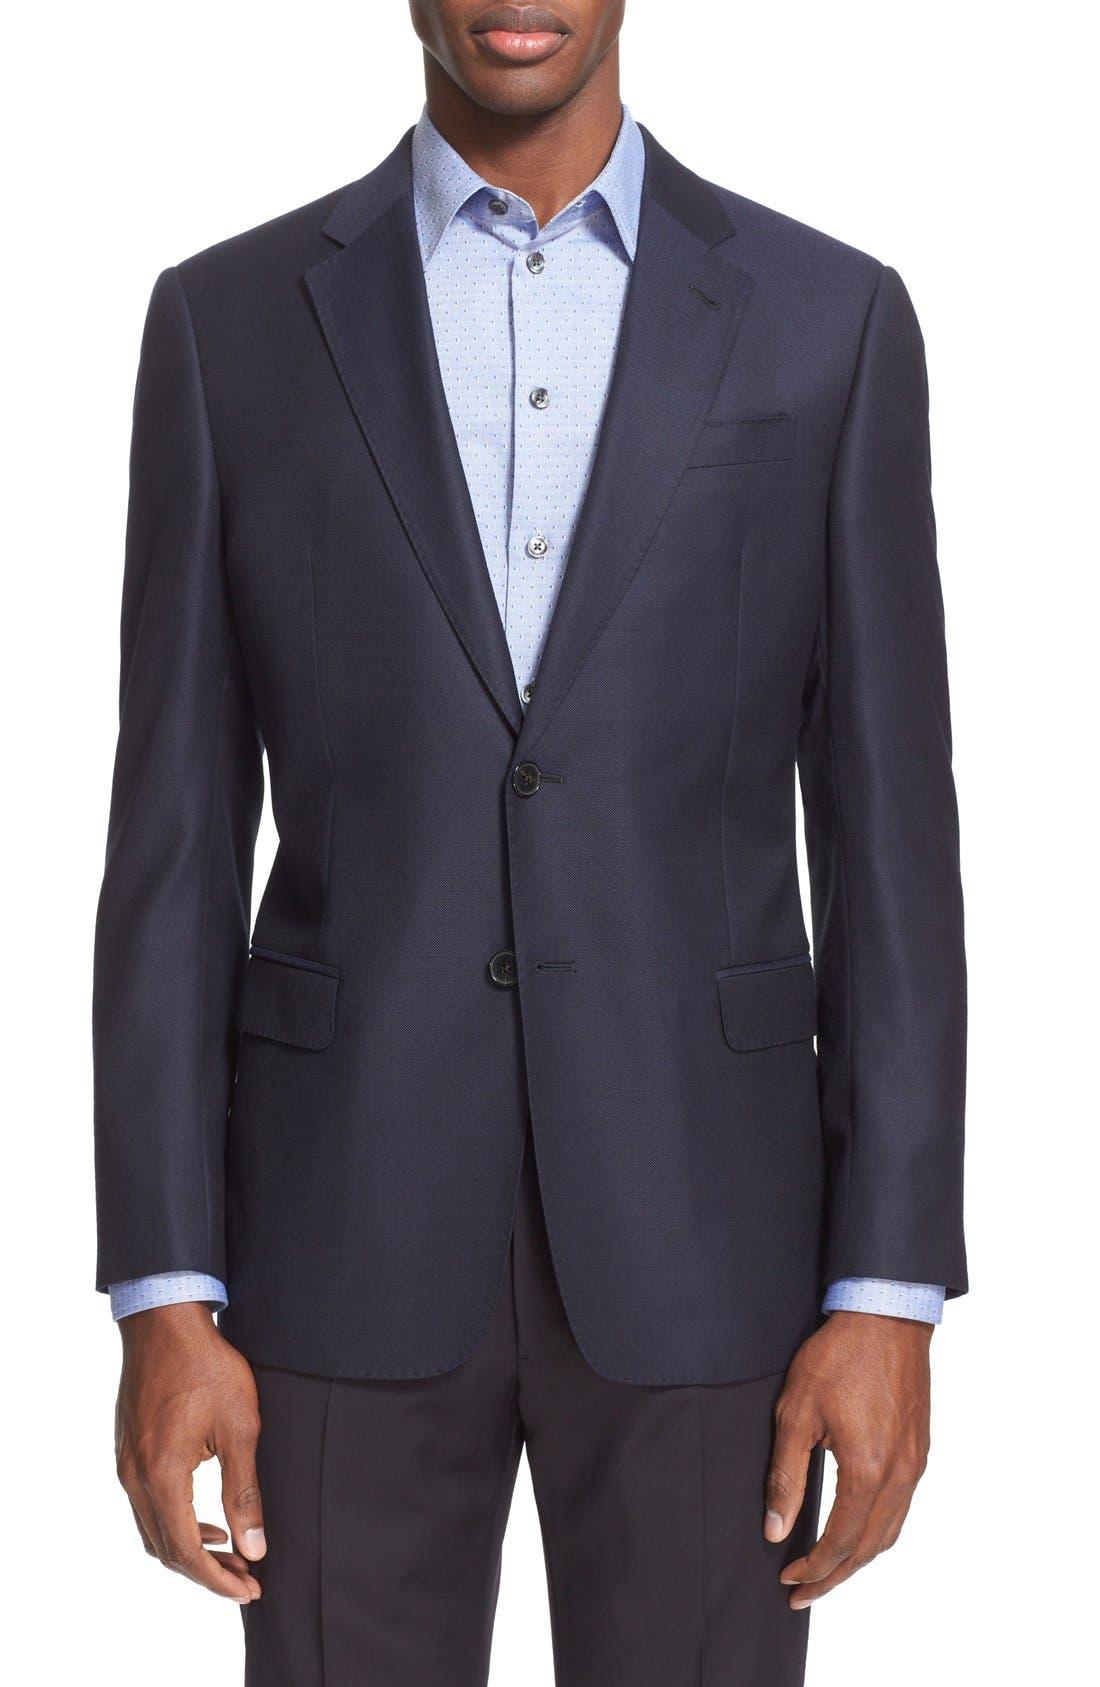 G-Line Trim Fit Wool Blazer,                         Main,                         color, Navy